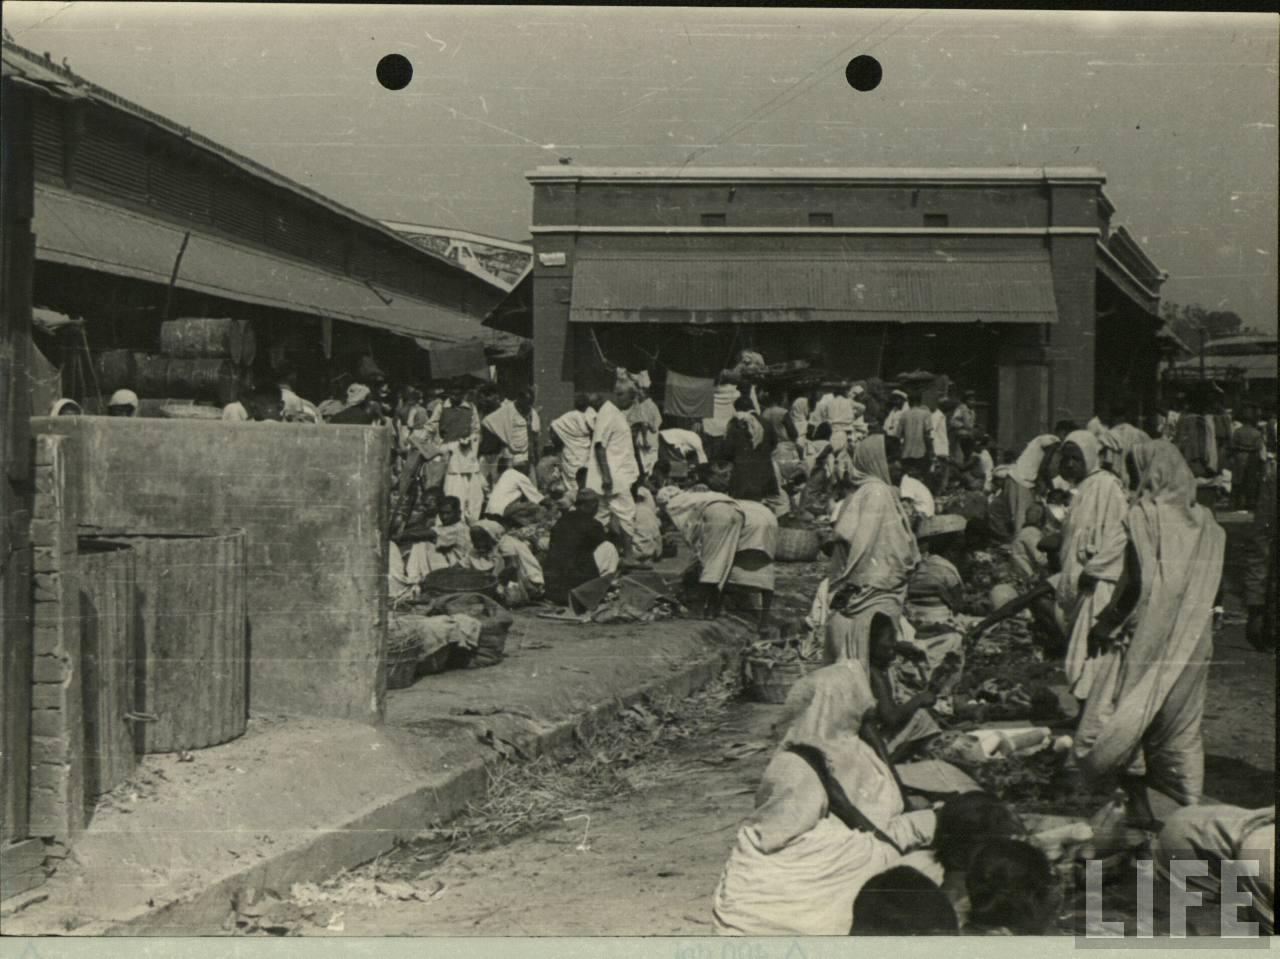 A Busy Indian Bazaar (Market) Scene